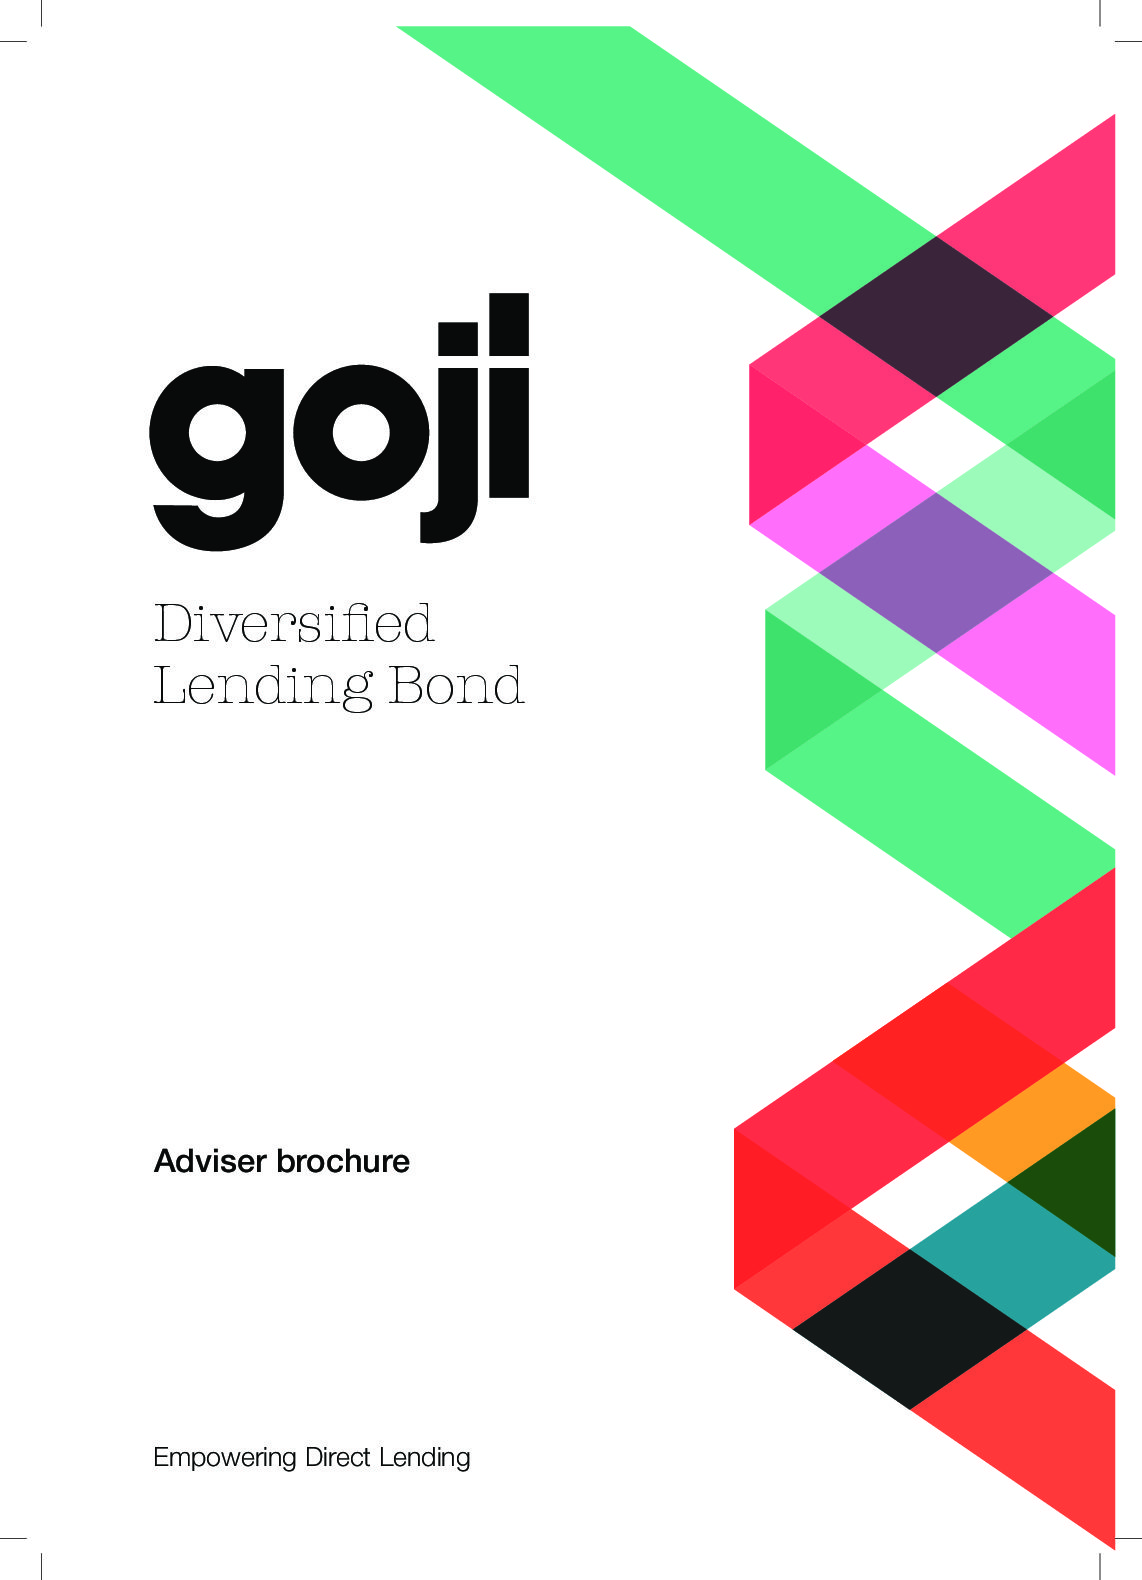 Diversified Lending Bond Adviser brochure-Goji Direct Lending Investment Experts